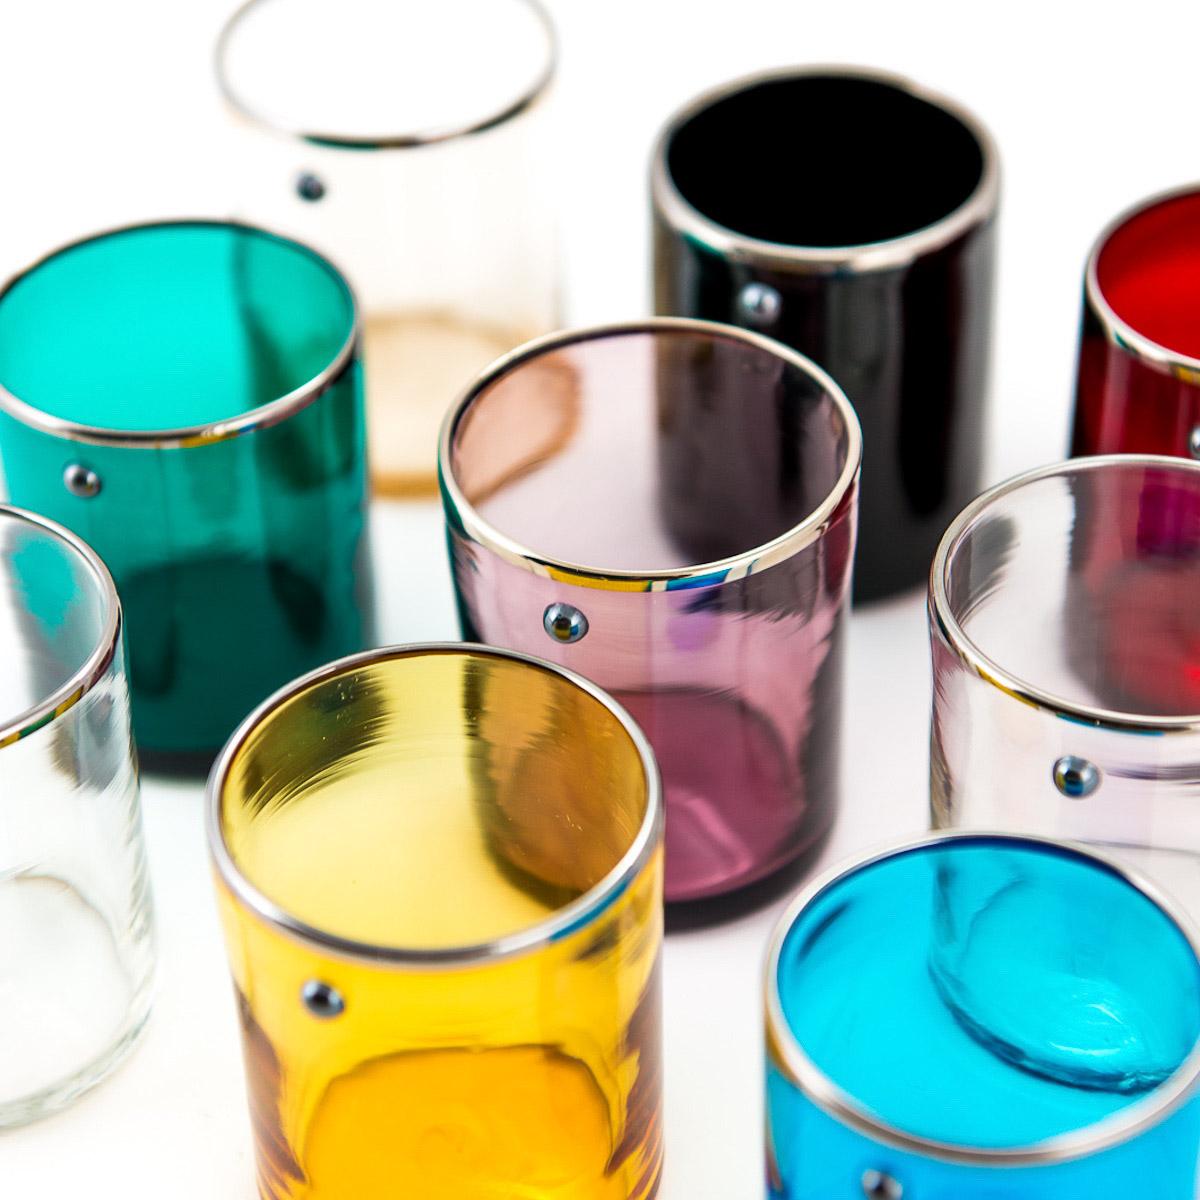 JAI-shot-glass-light-amethist-murano-vodka-venice-handmade-platinum-rim